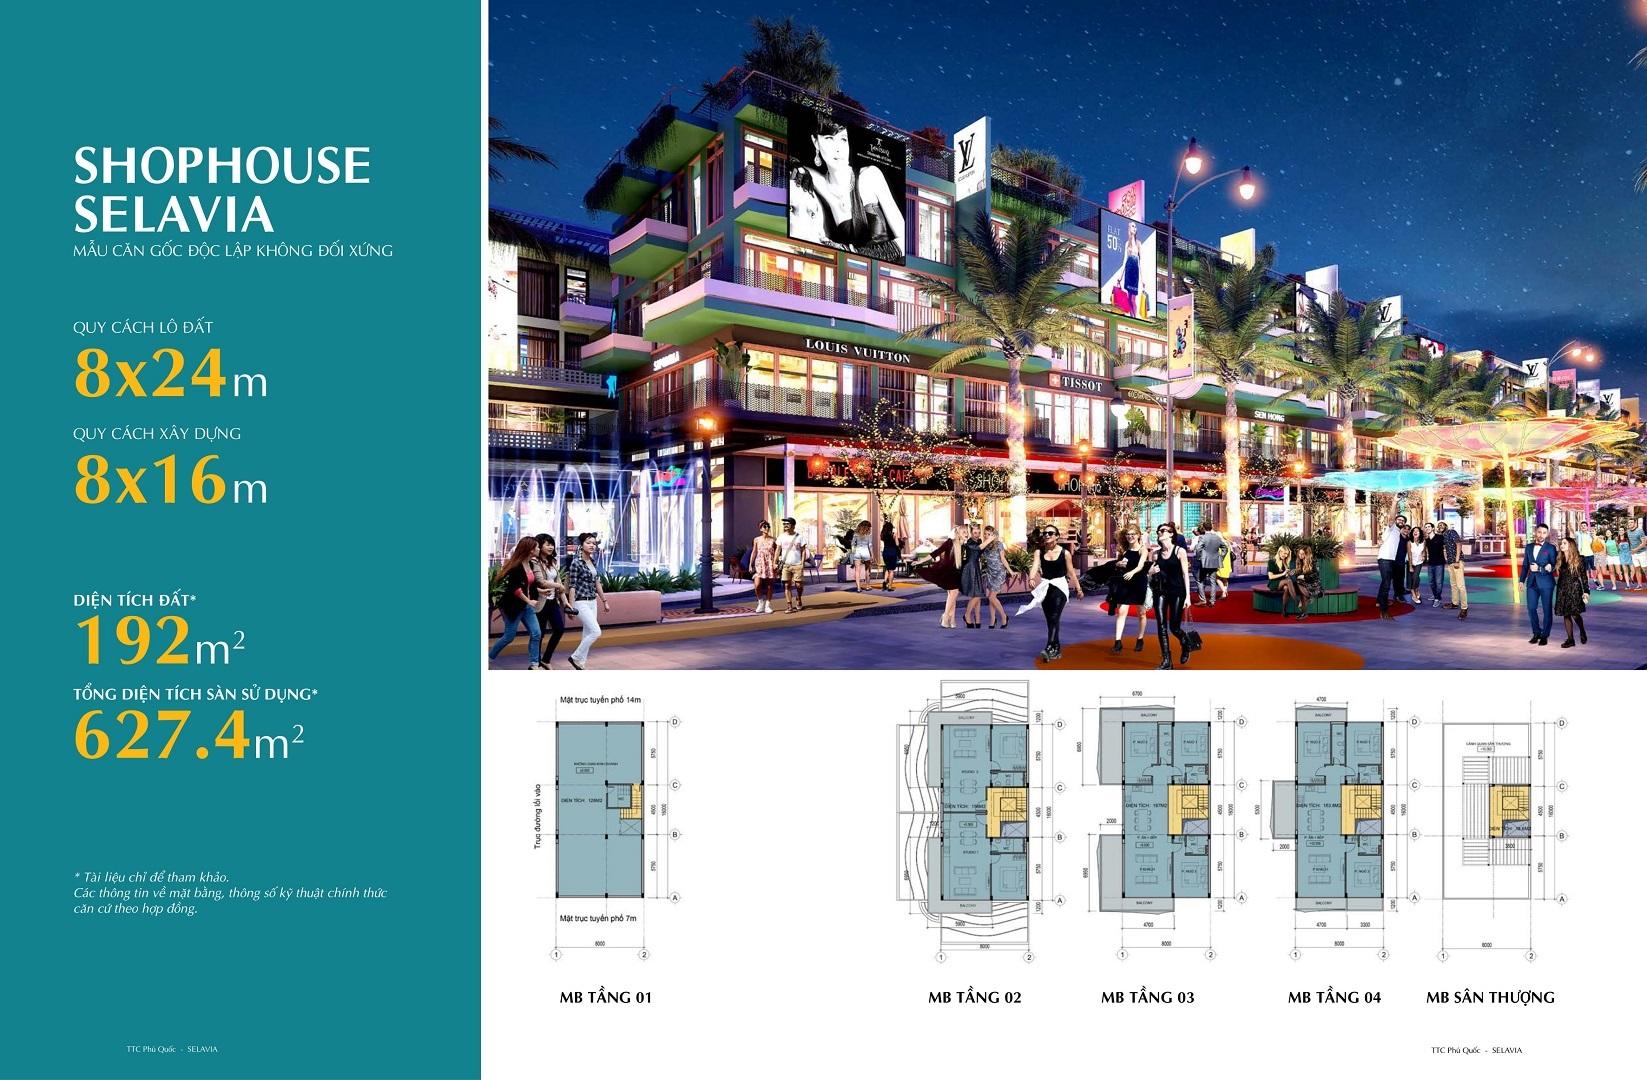 thiết kế shophouse selavia phú quốc mẫu 2